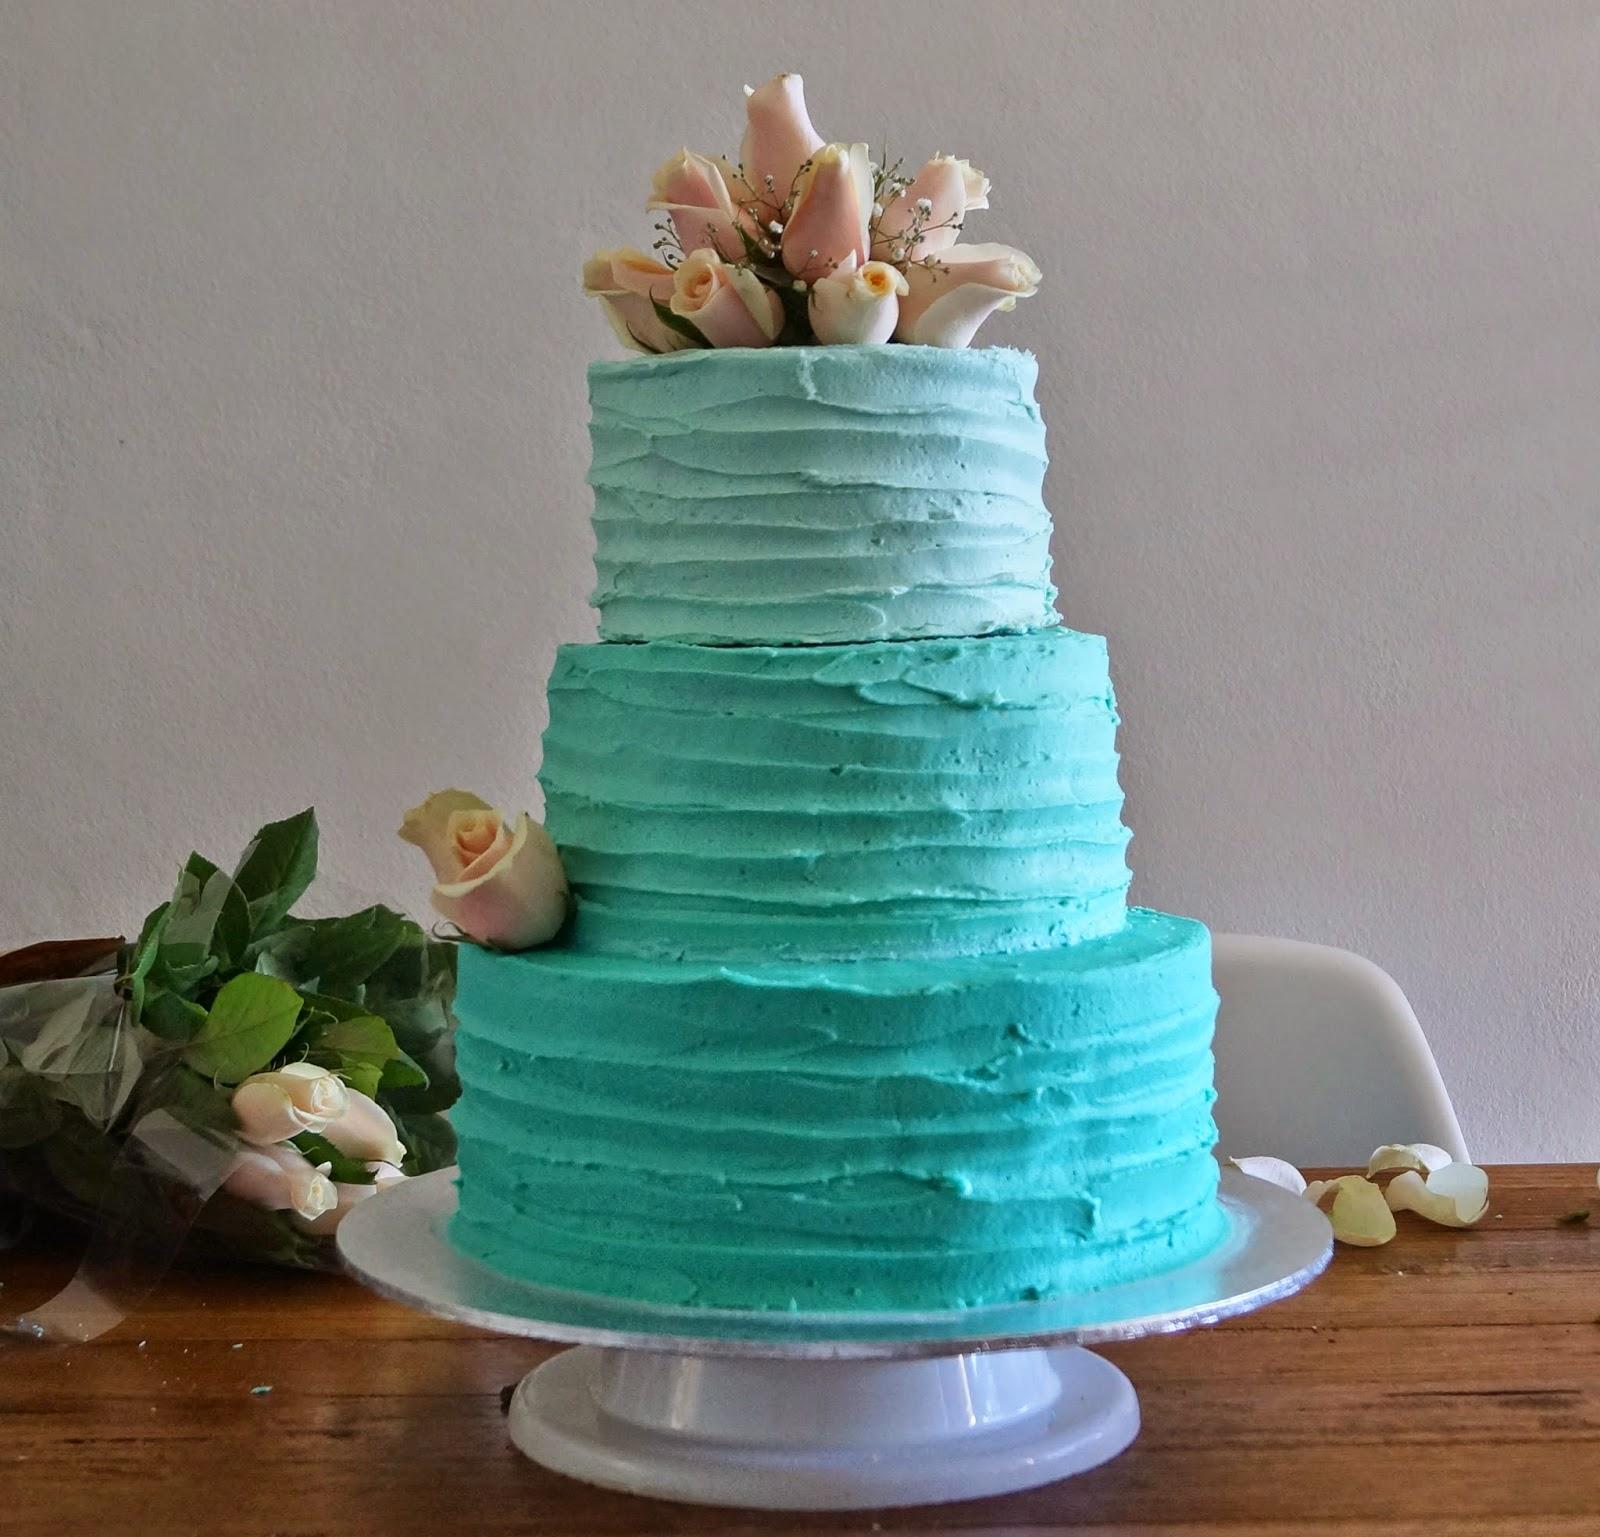 Mfh the tiffany blue wedding cake the tiffany blue wedding cake junglespirit Image collections